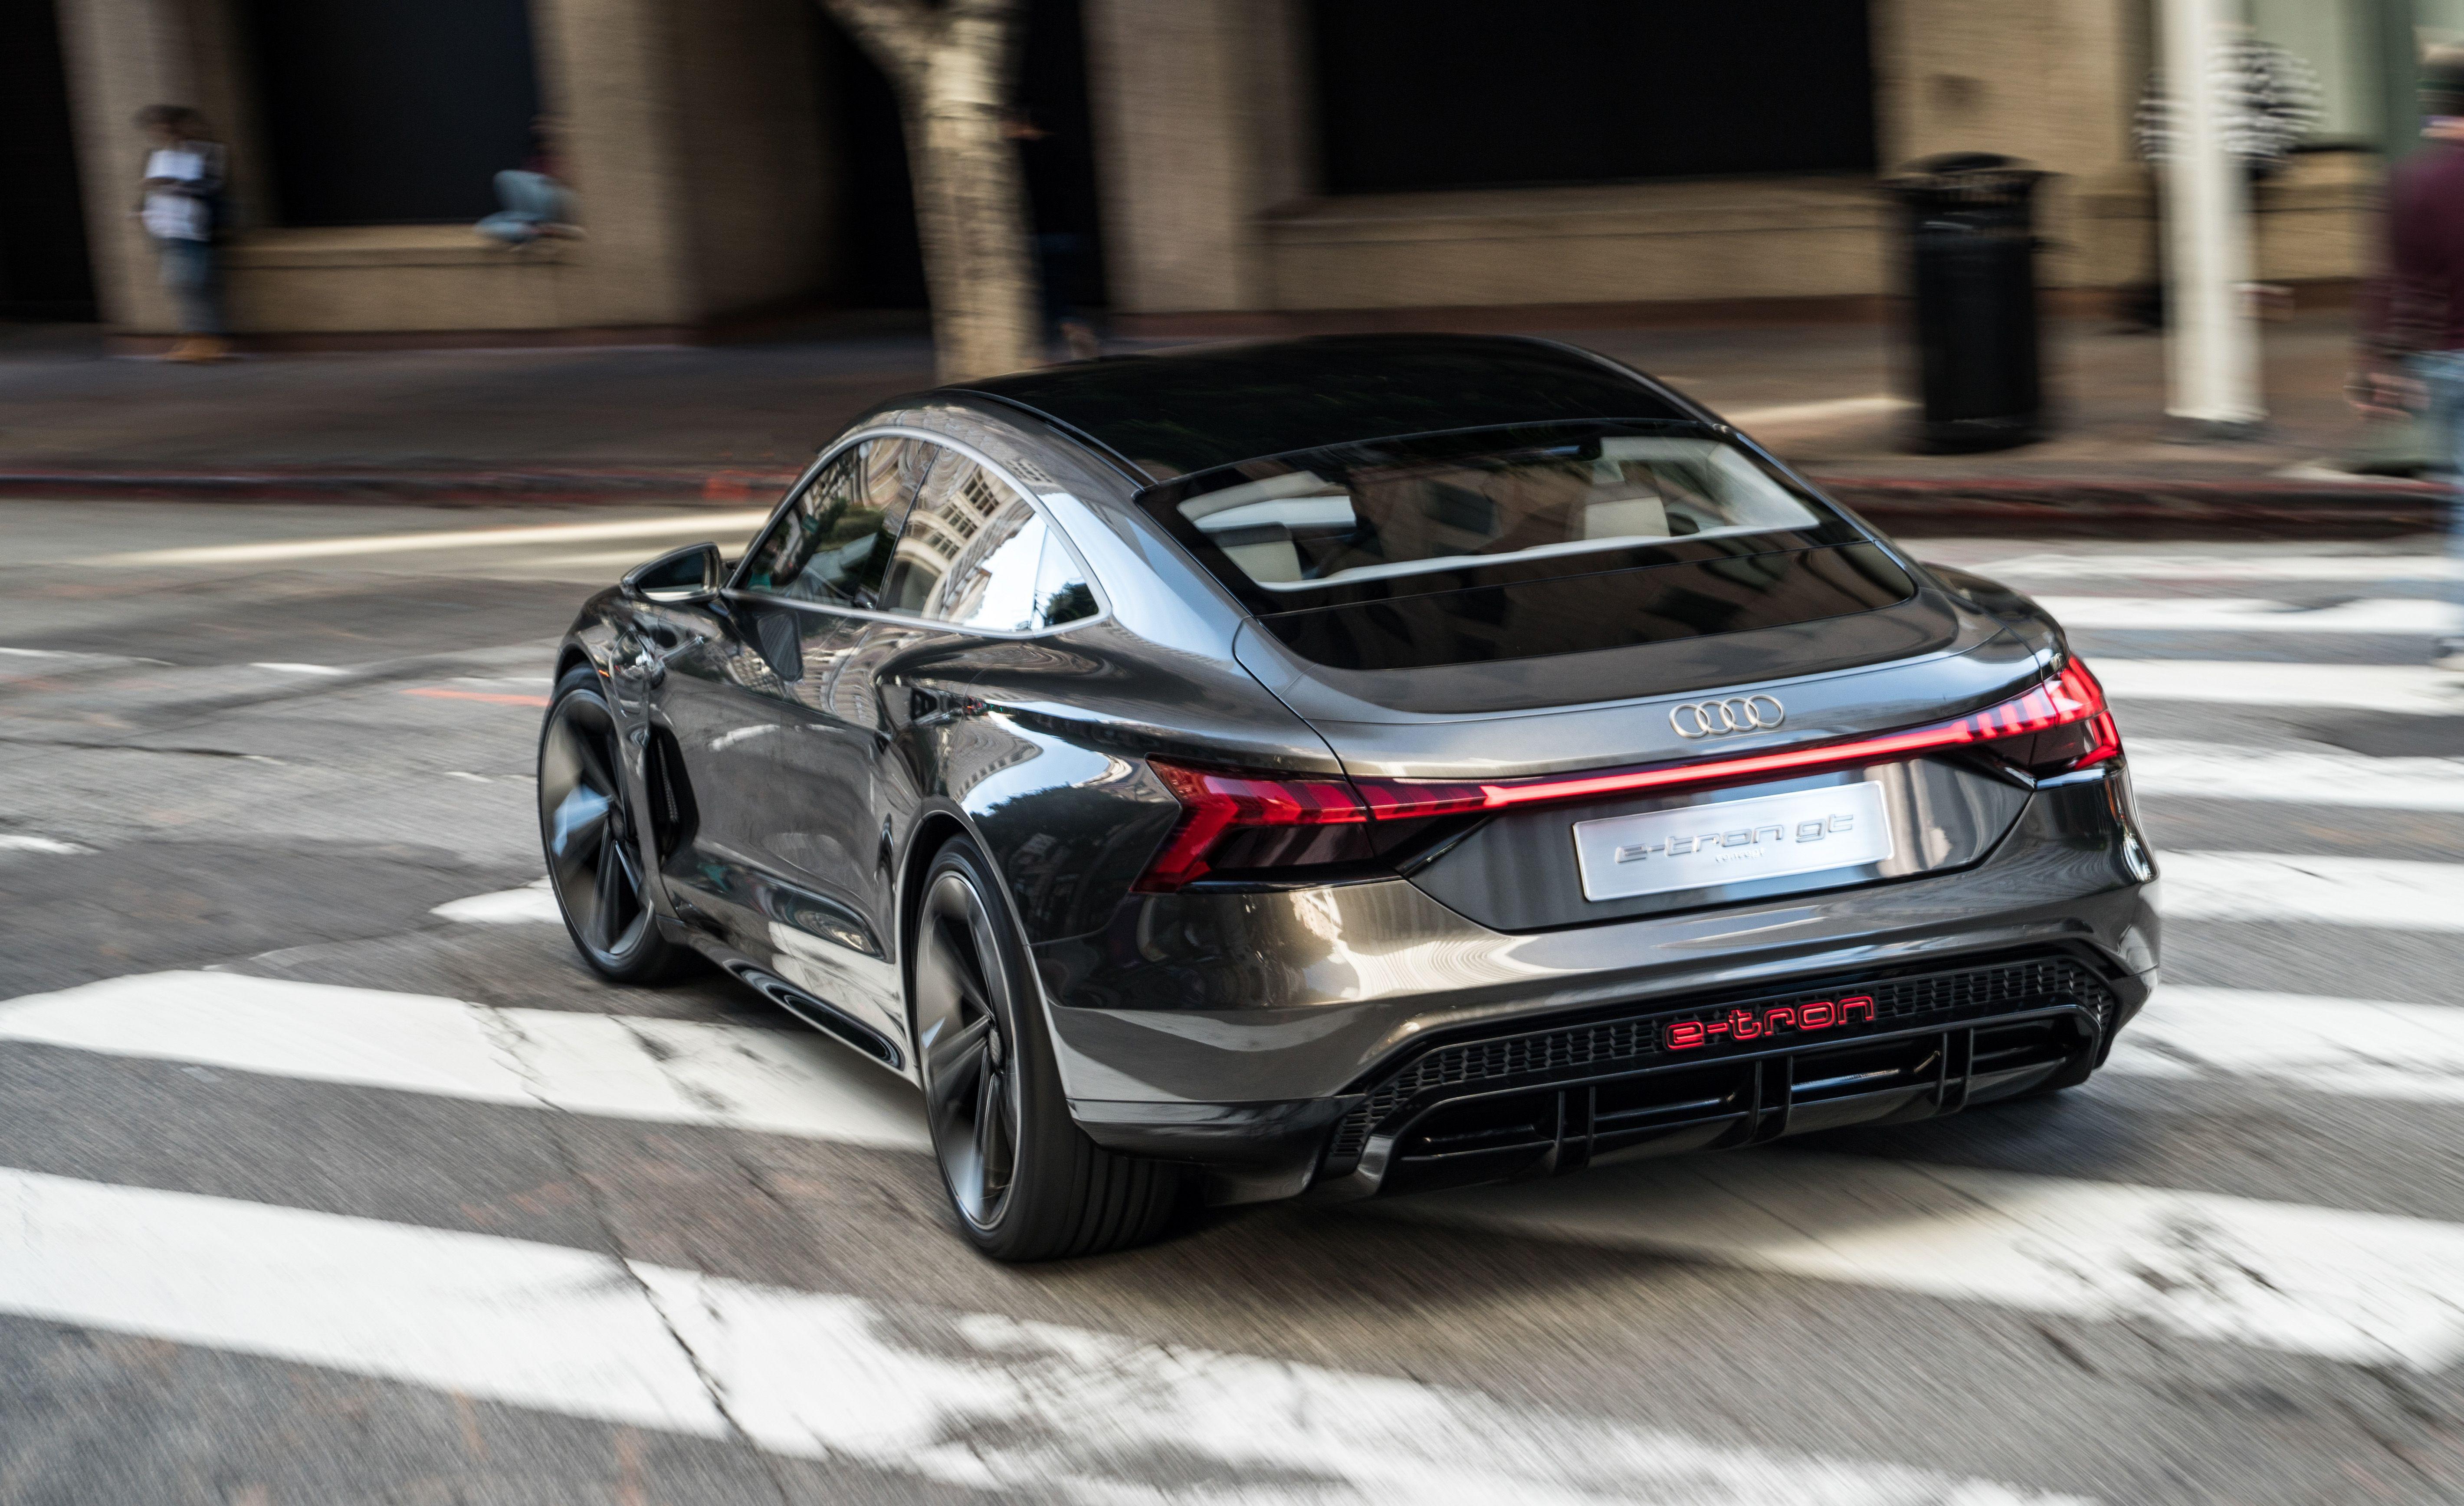 2019 Audi E Tron Gt Reviews Audi E Tron Gt Price Photos And